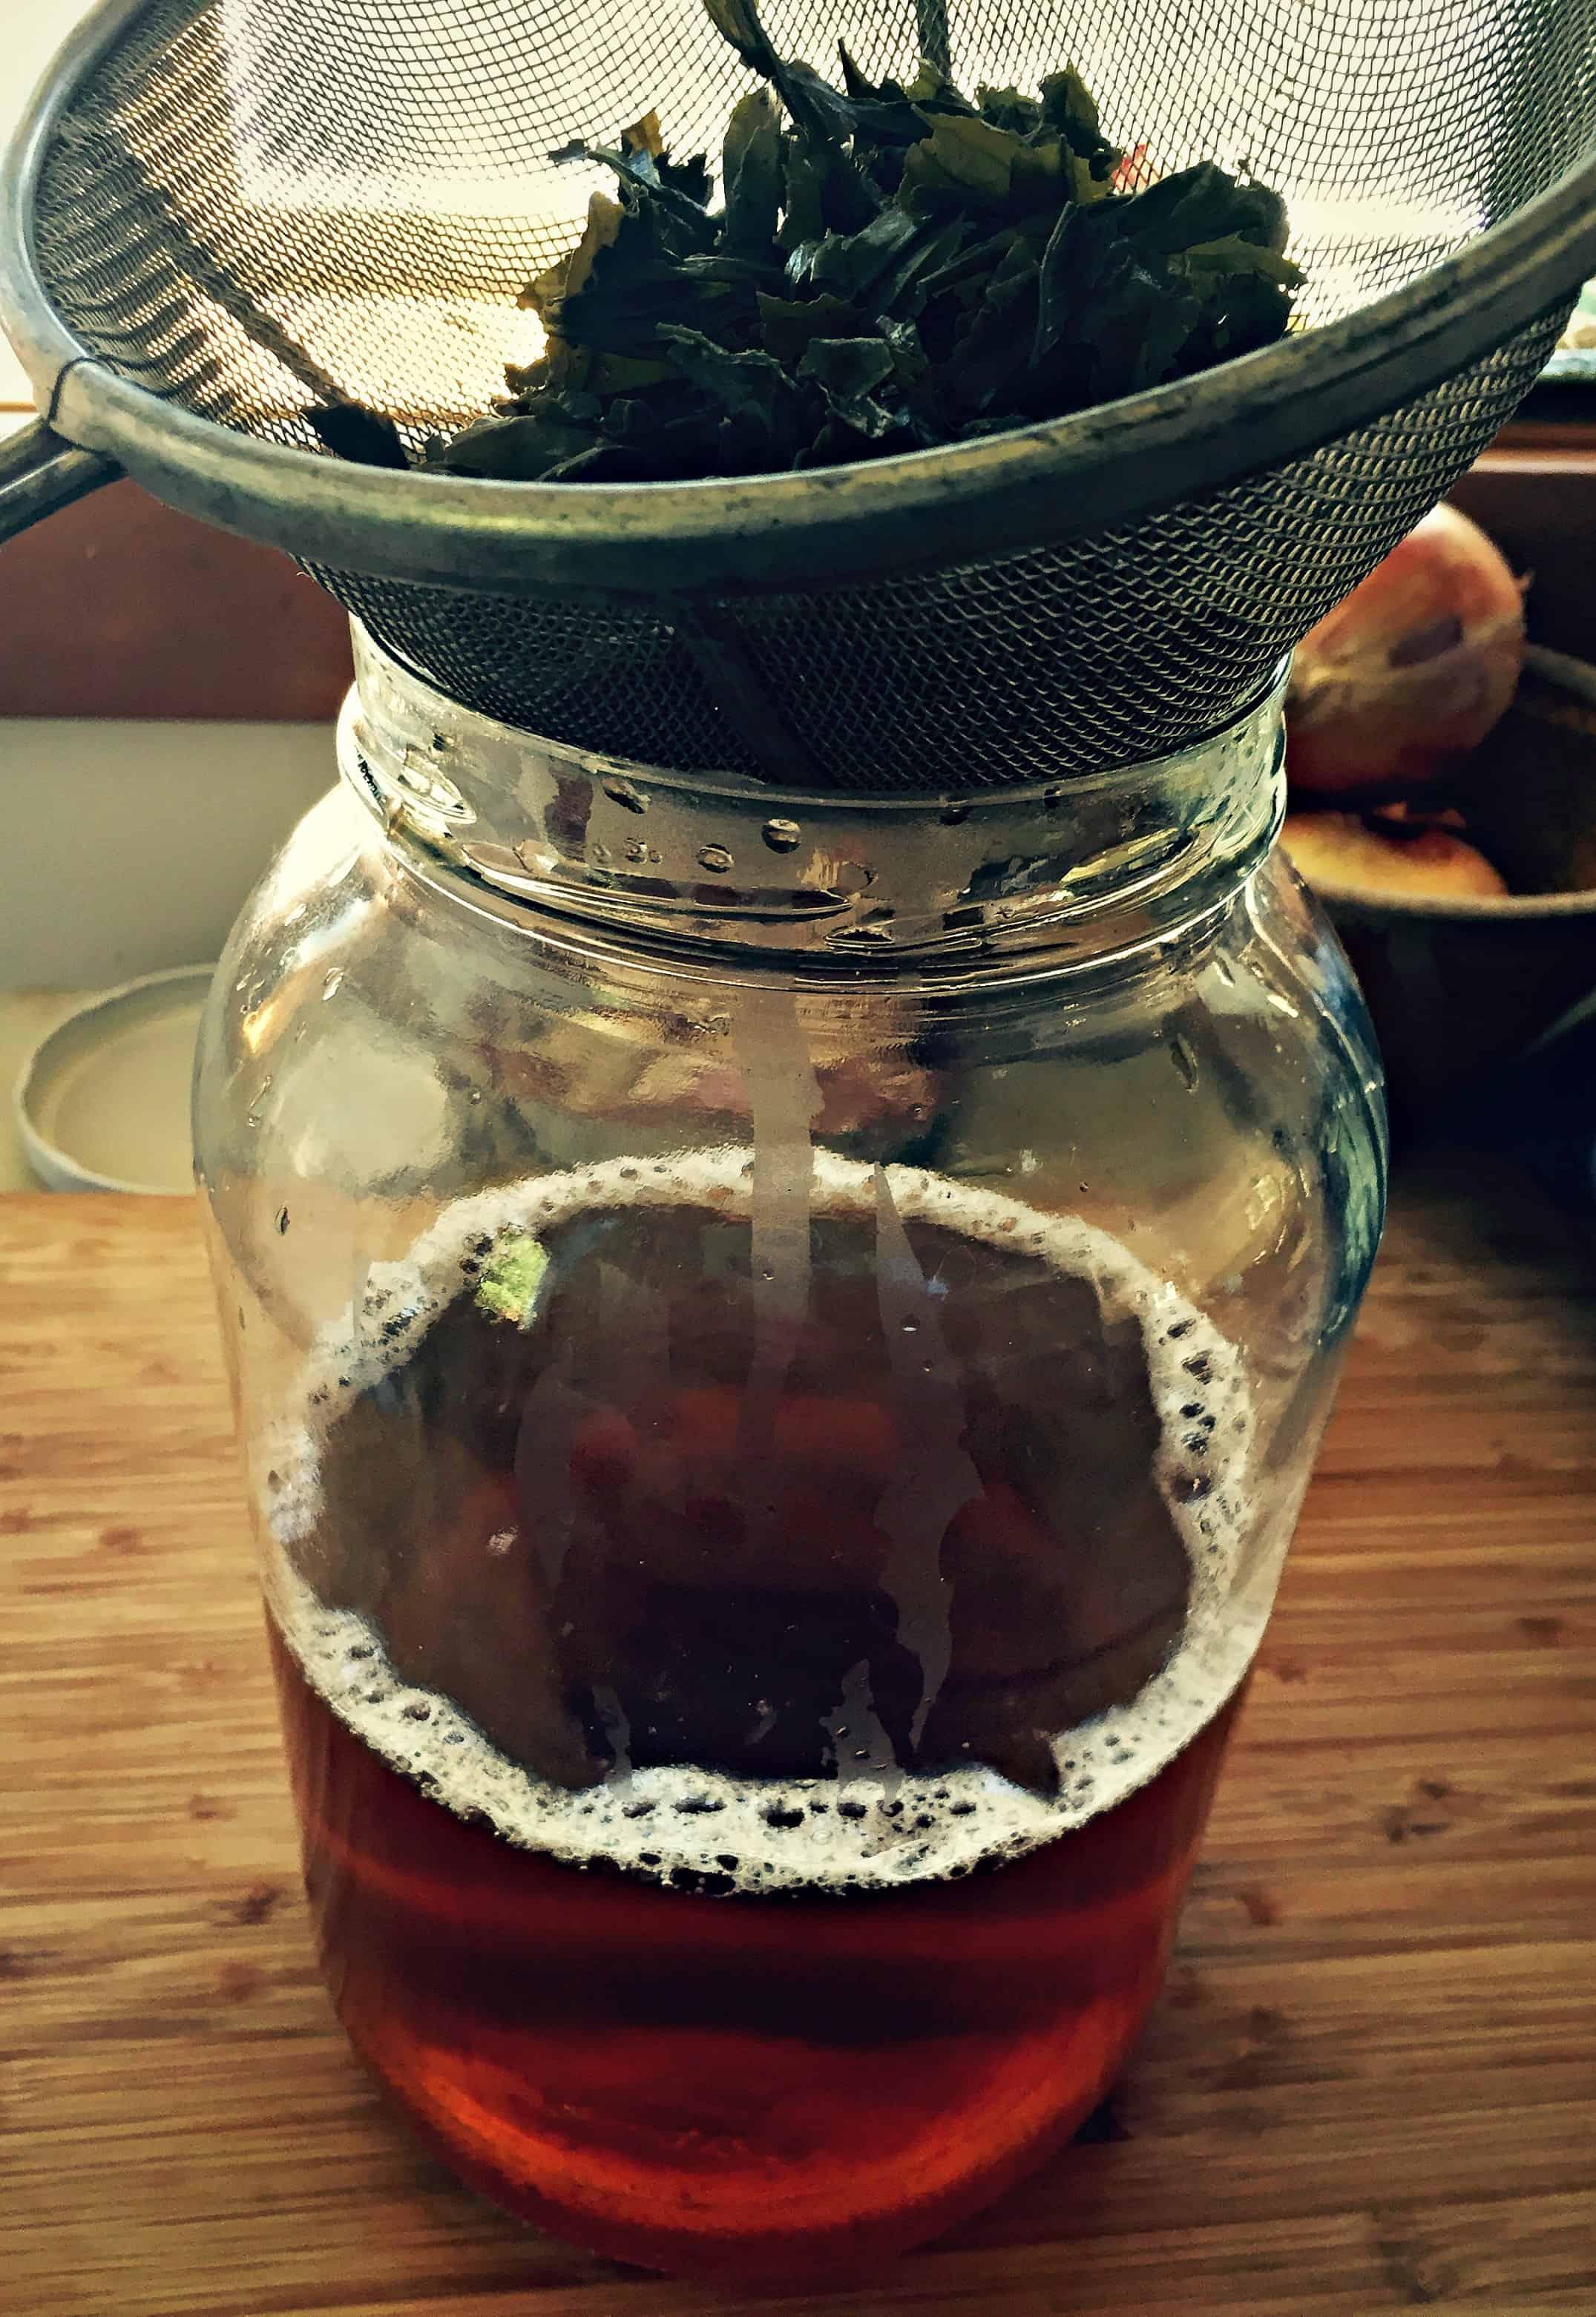 strain green tea